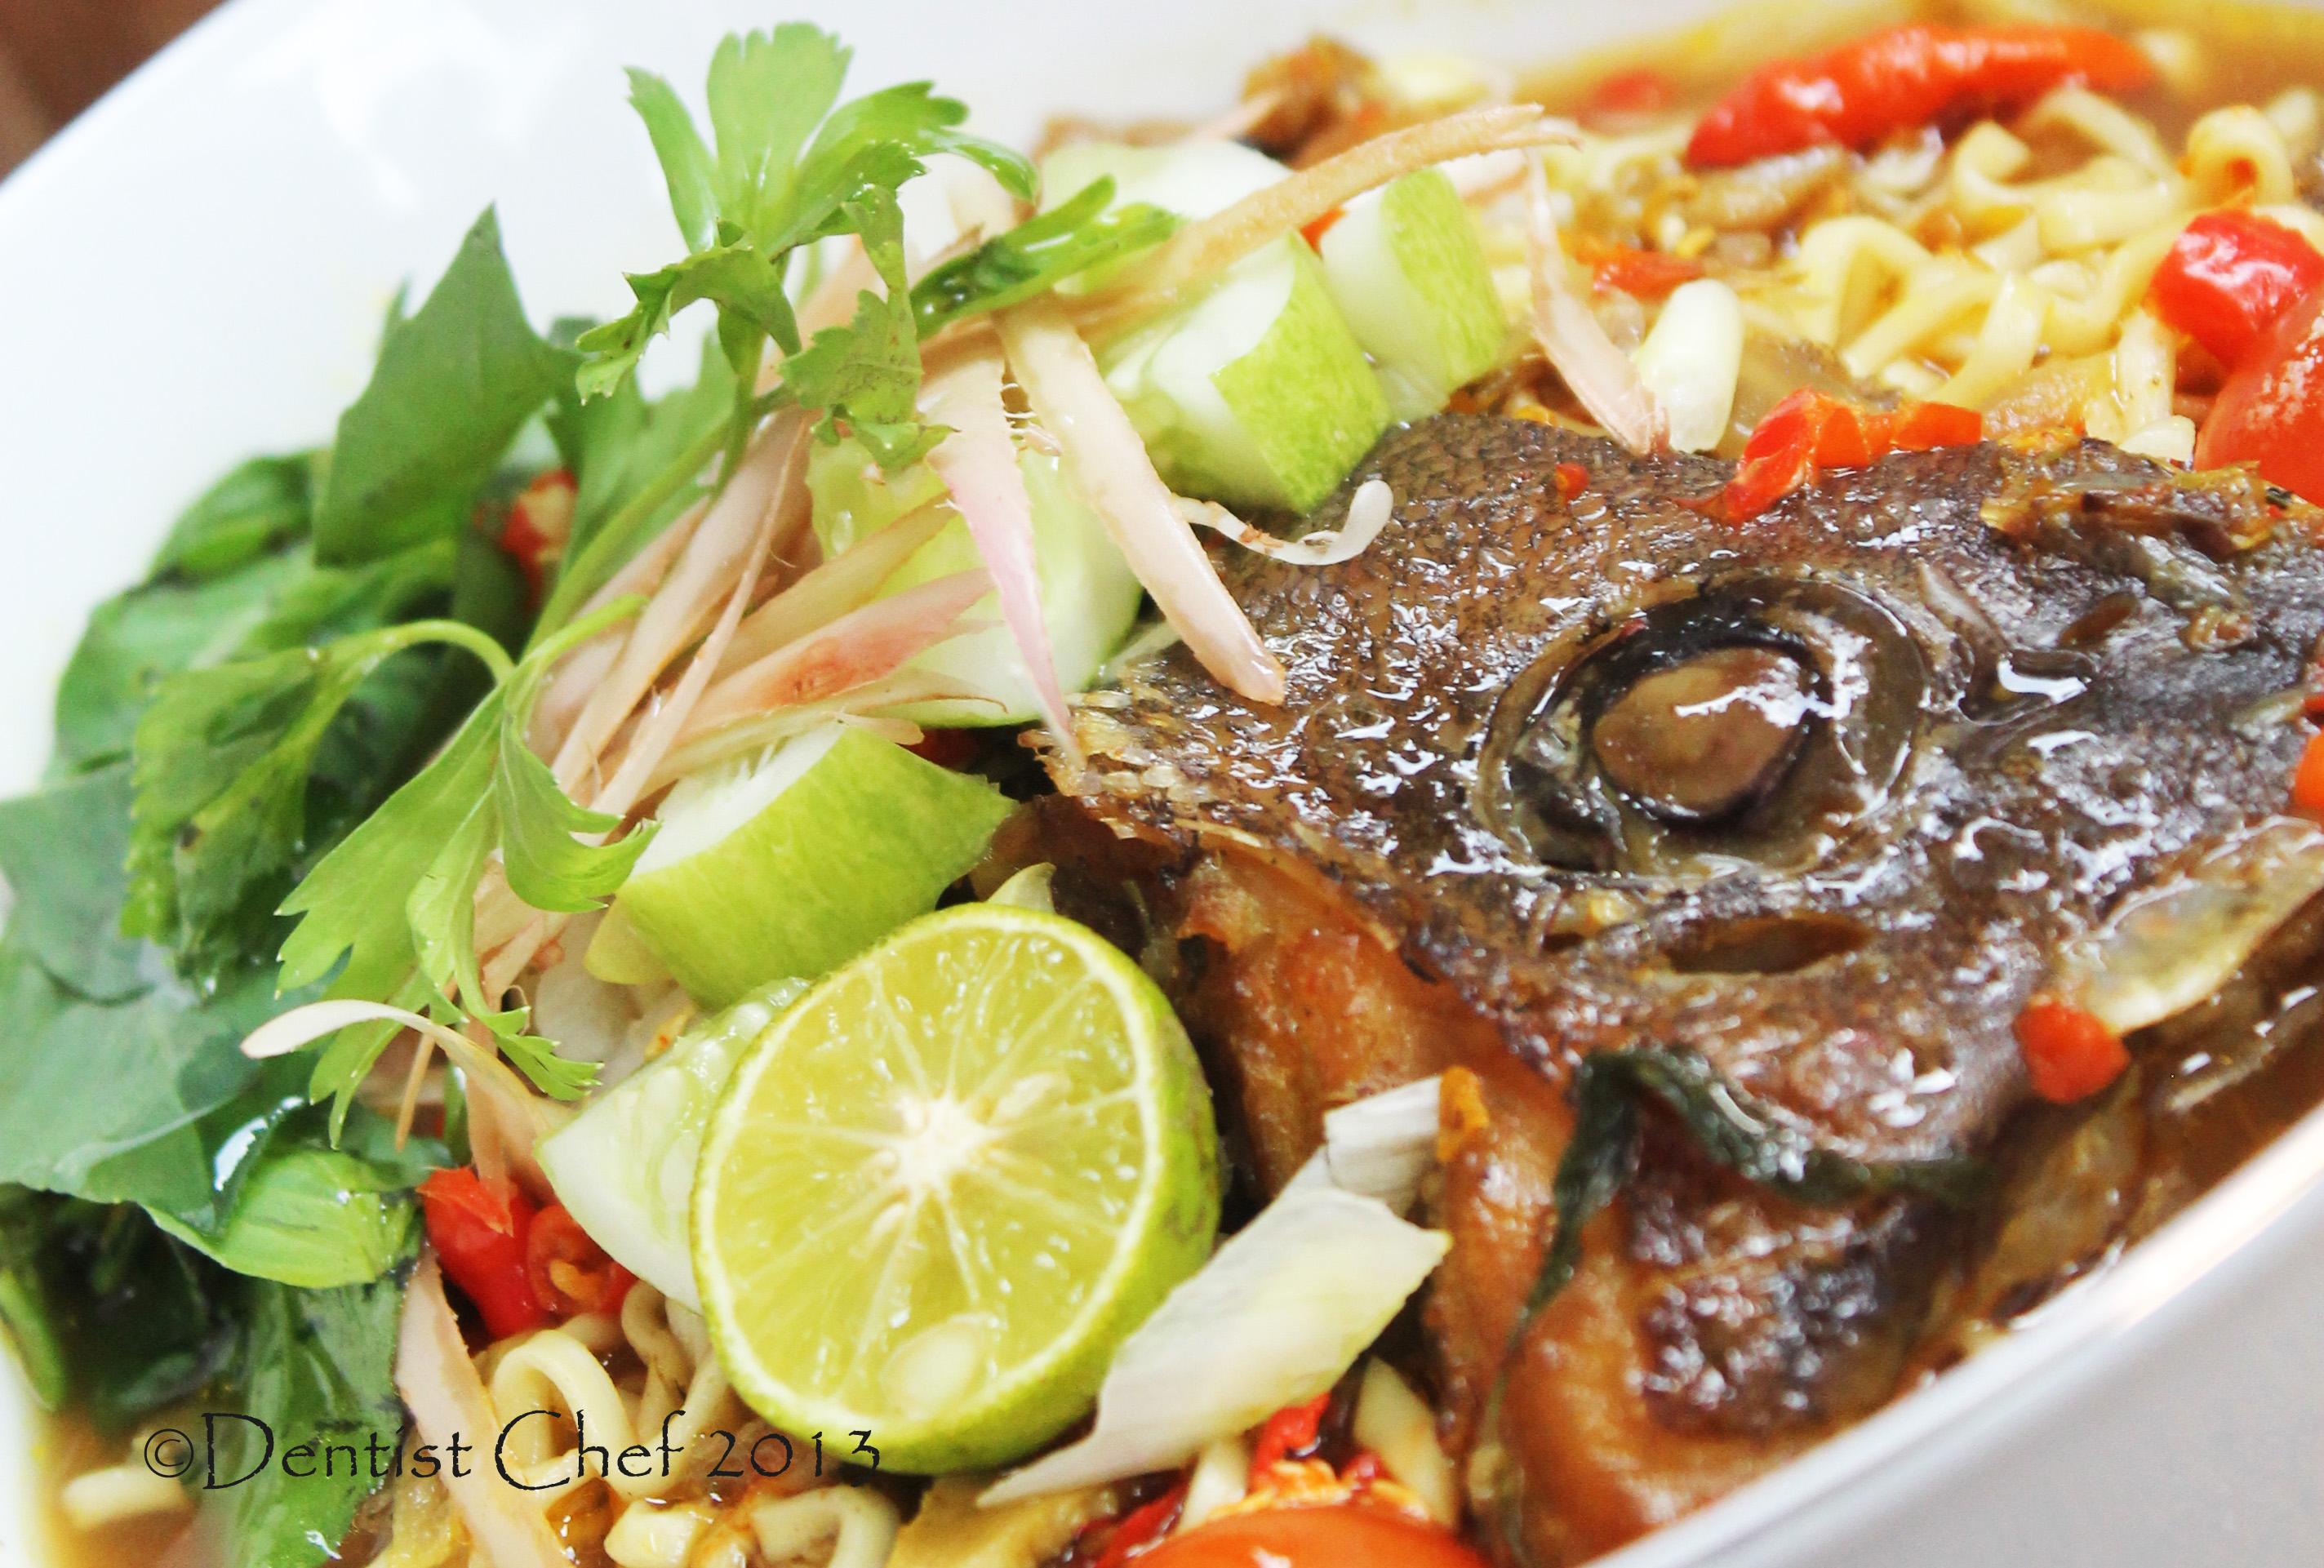 Head fish recipes images for Fish head recipe